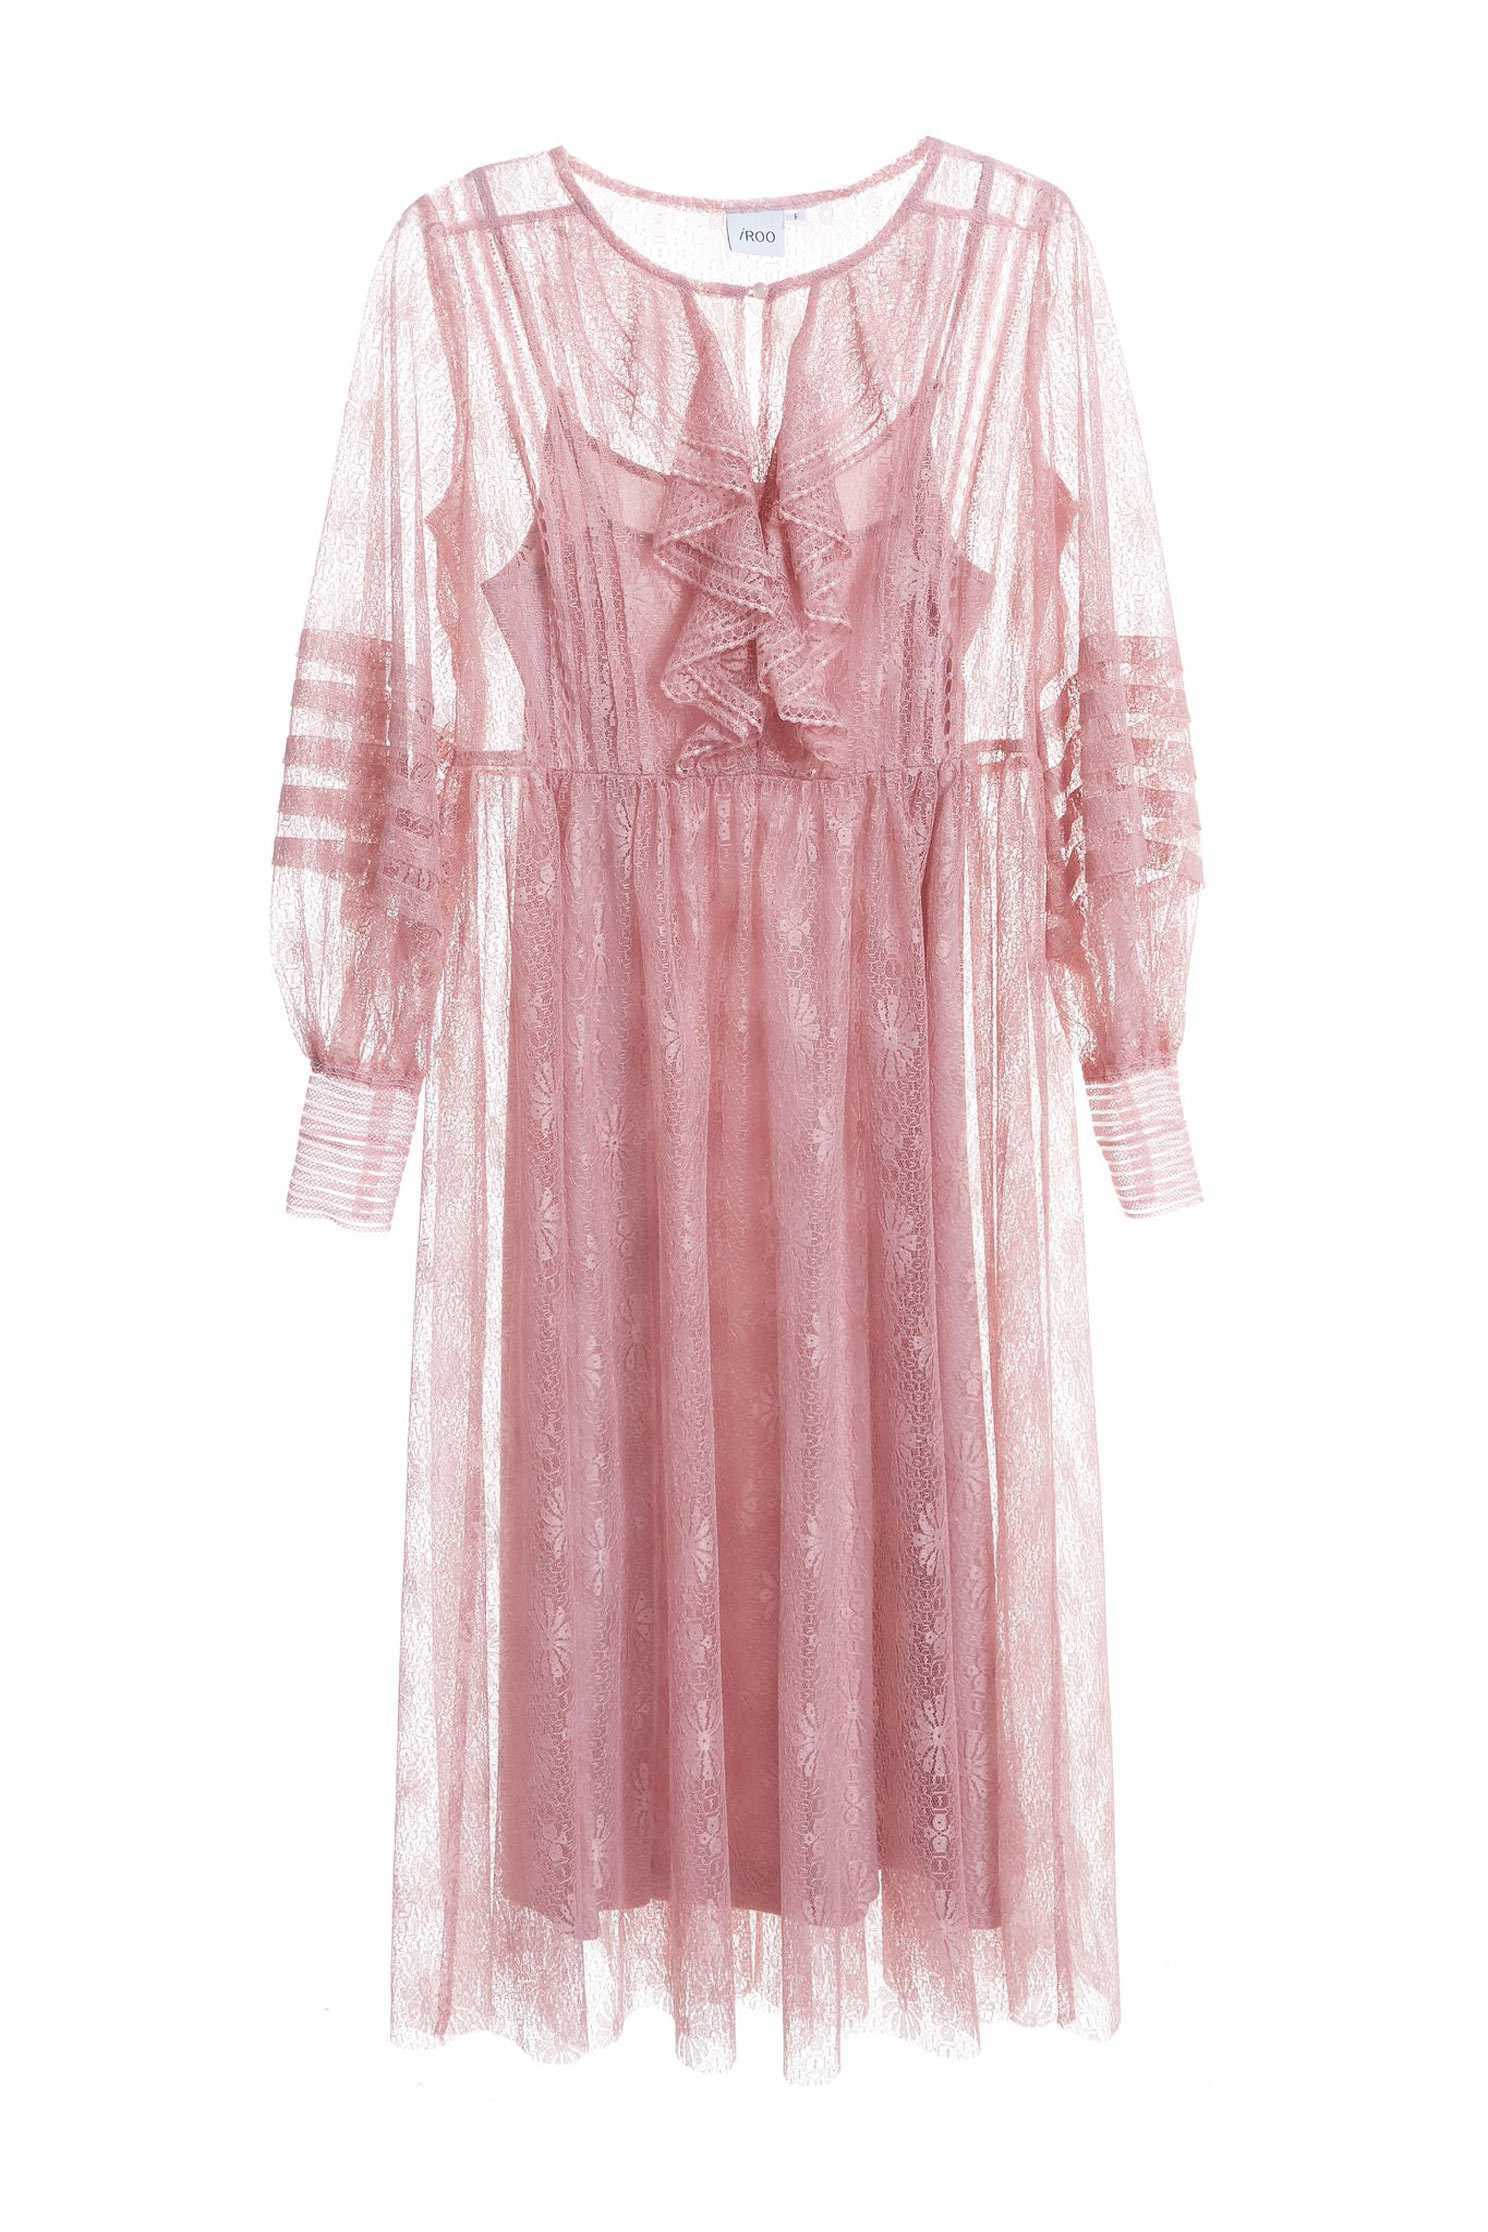 Dry rose lace dress